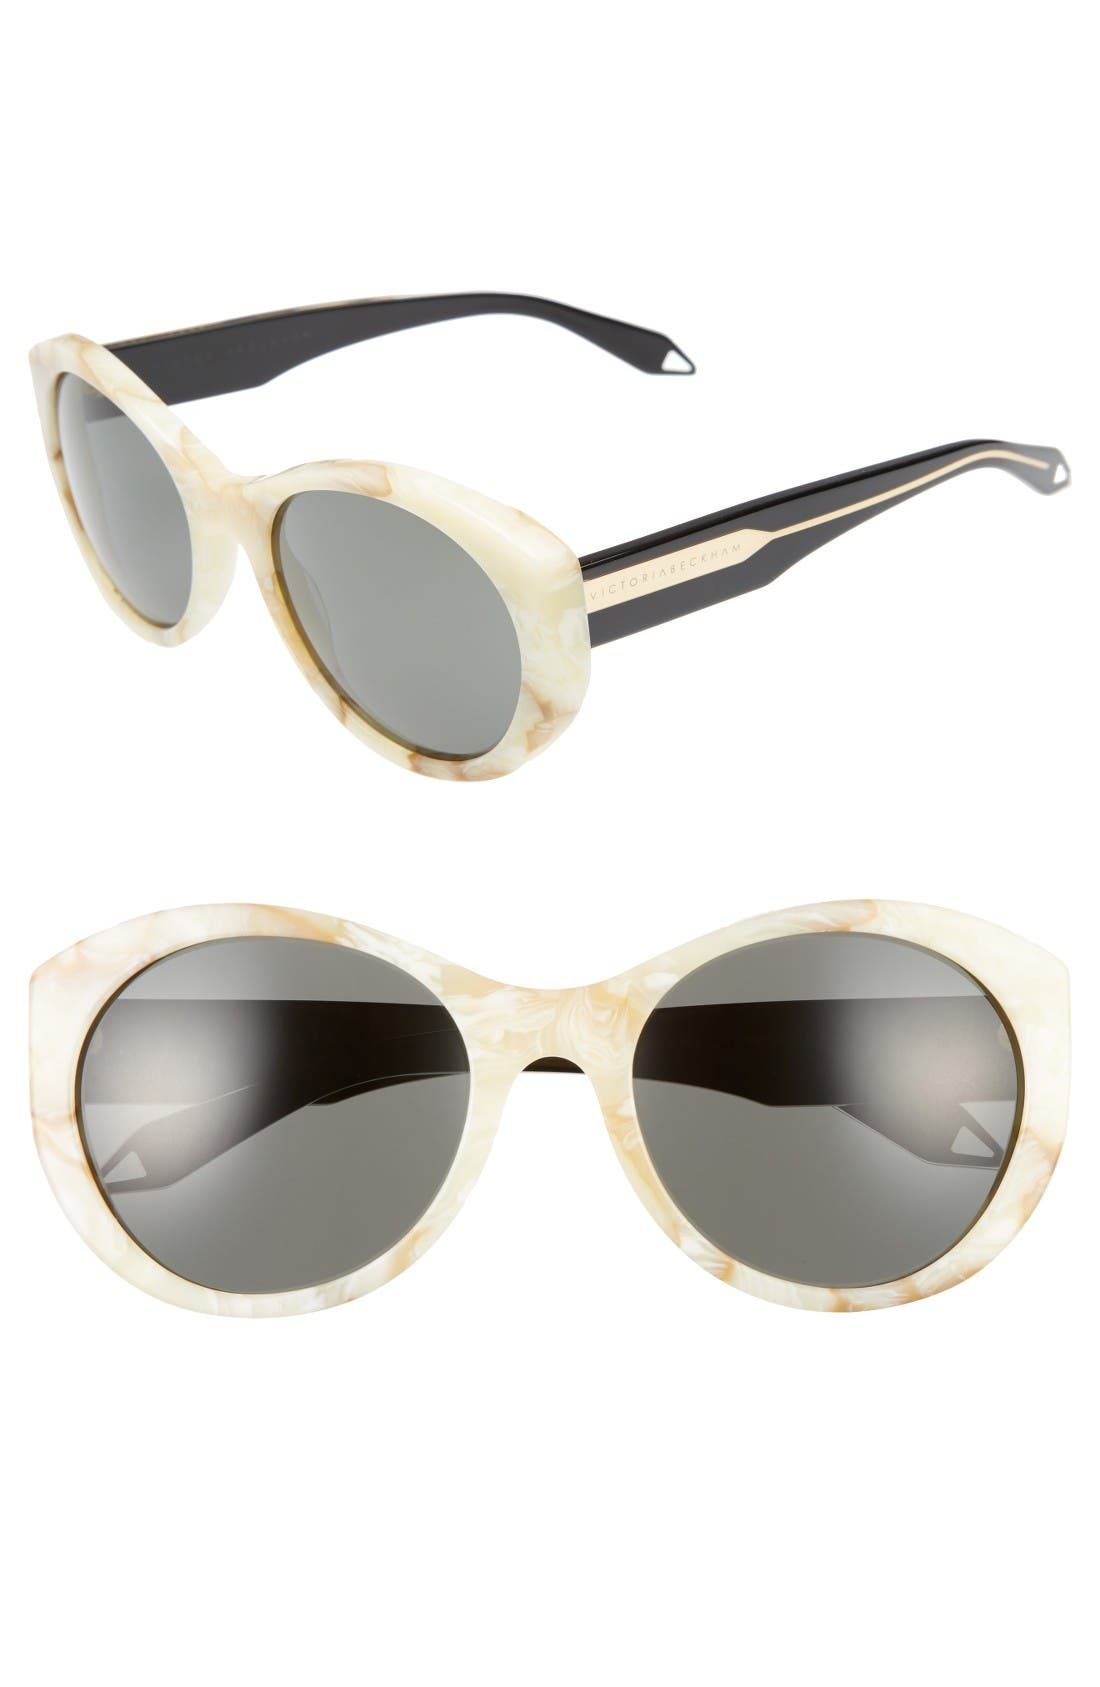 Victoria Beckham Fine Oval 59mm Sunglasses